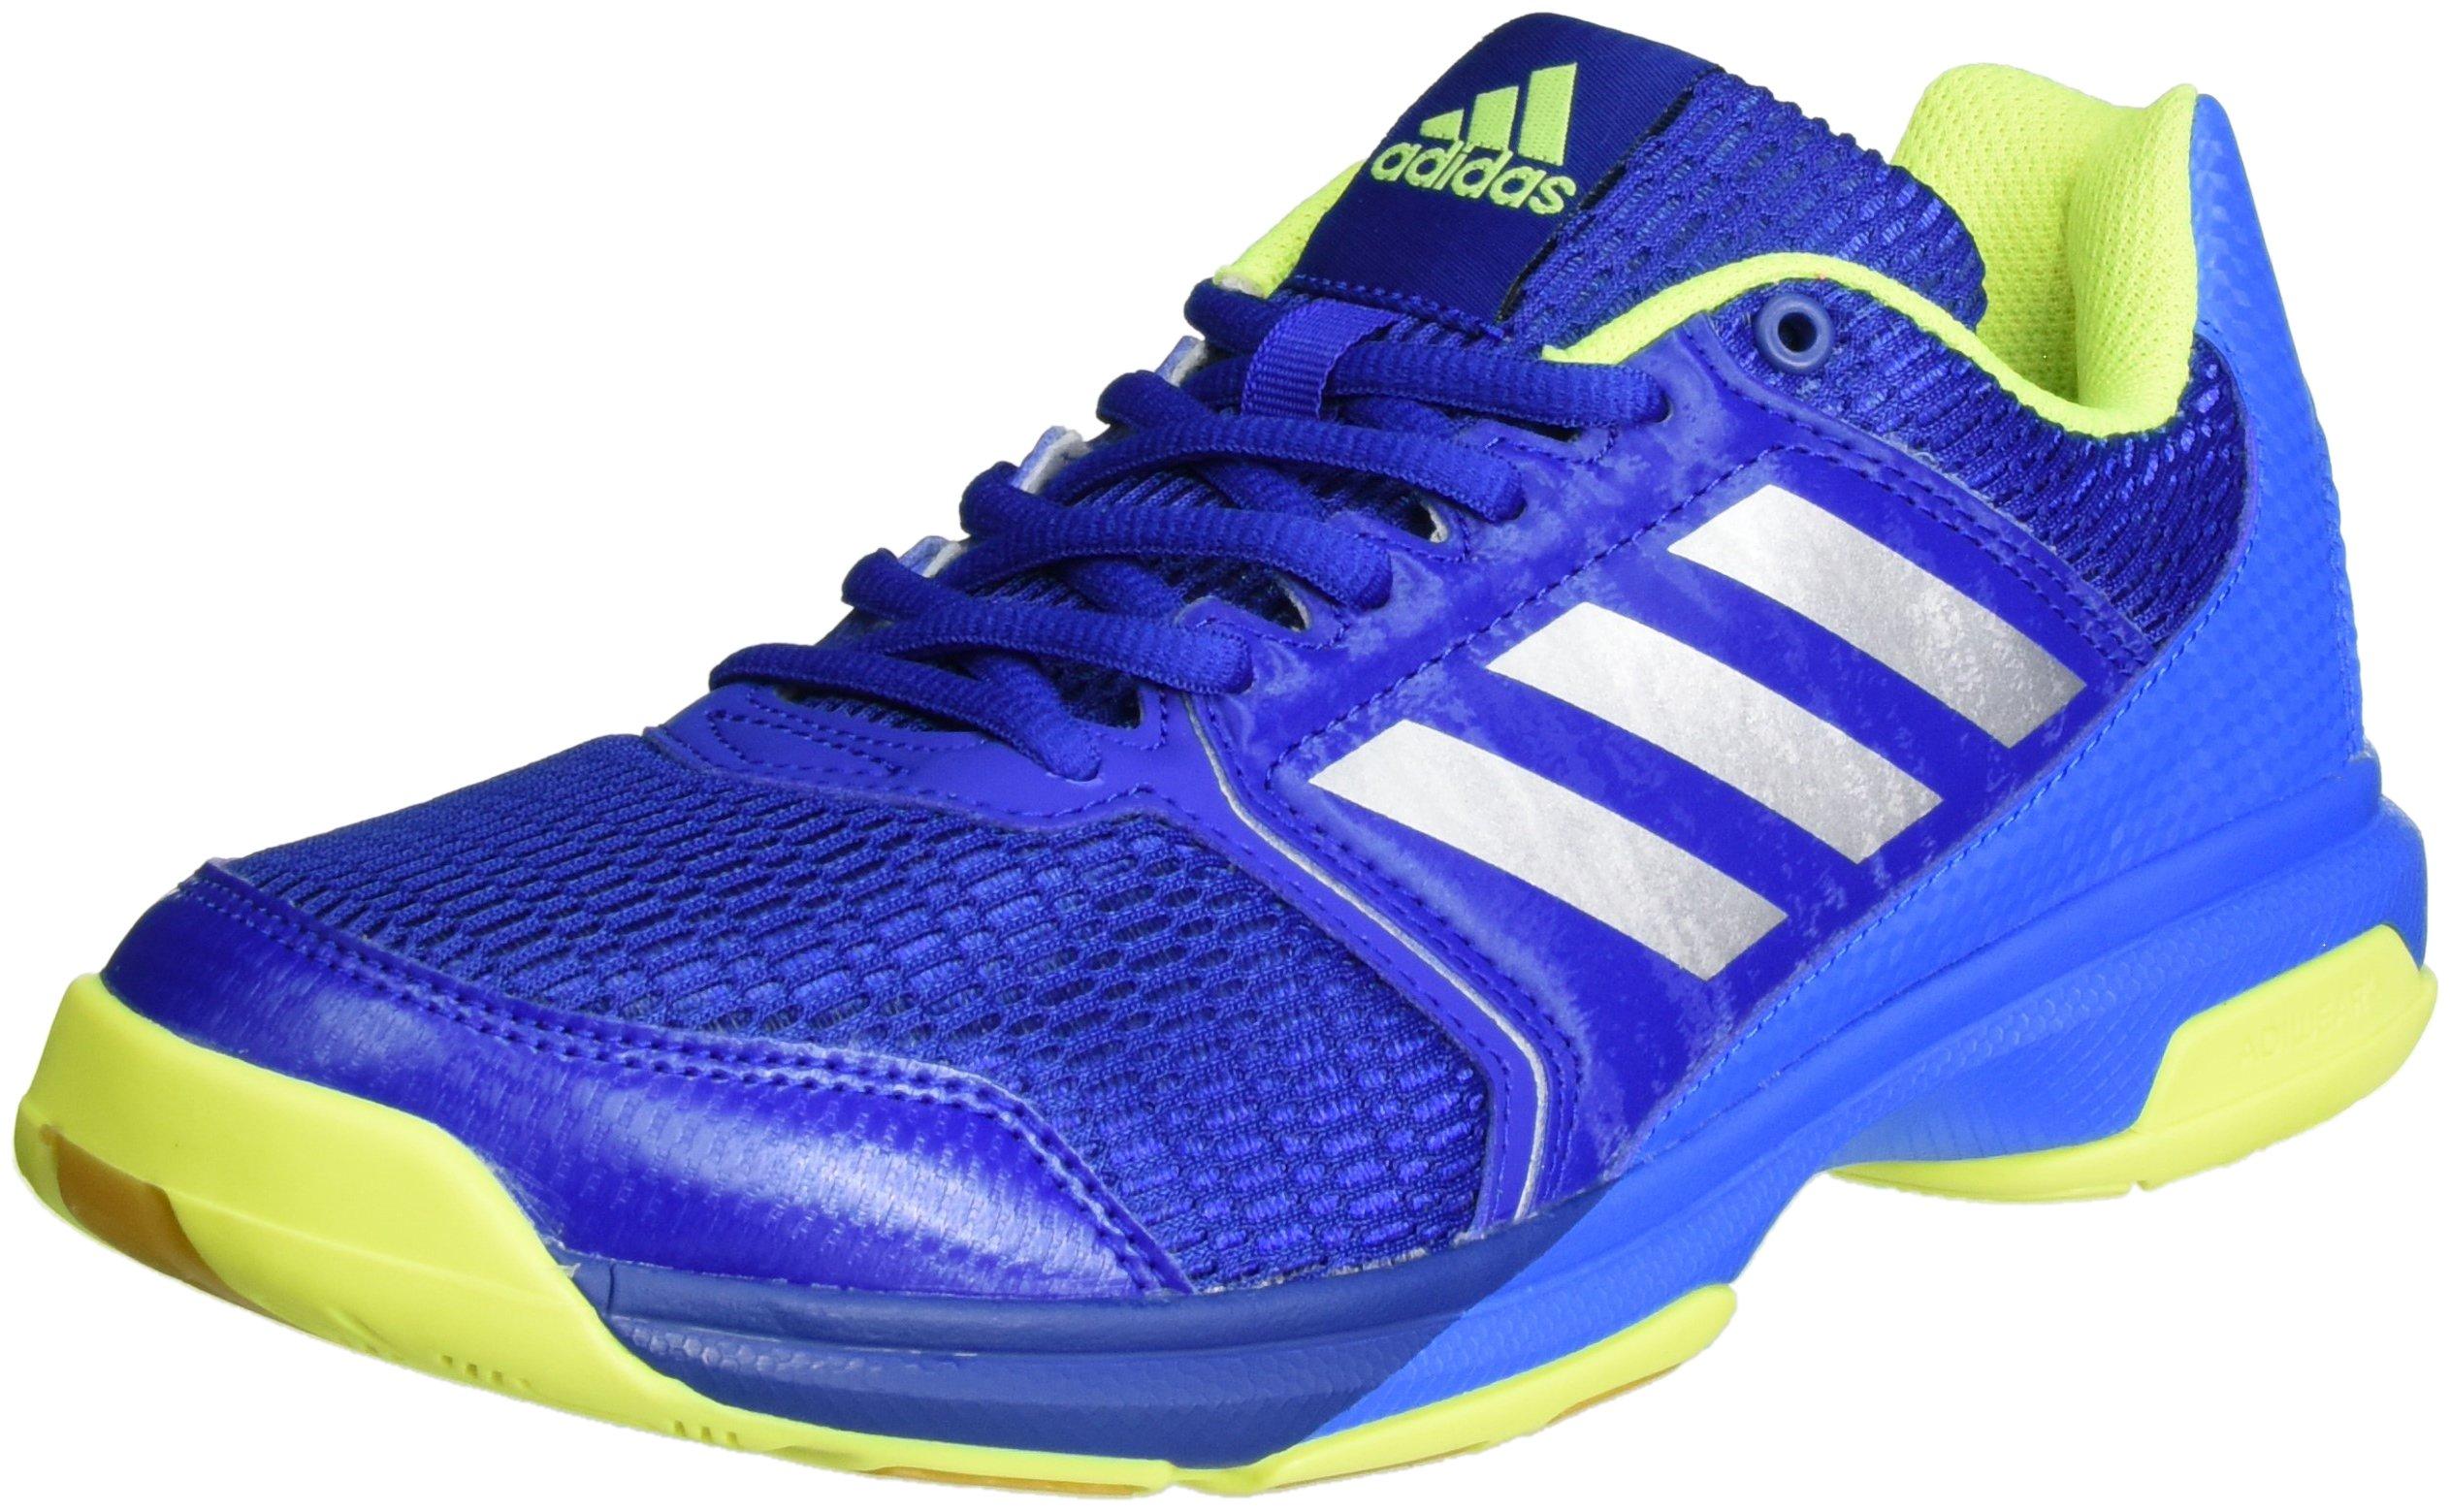 adidas Men's Multido Essence Handball Shoes- Buy Online in Saint ...